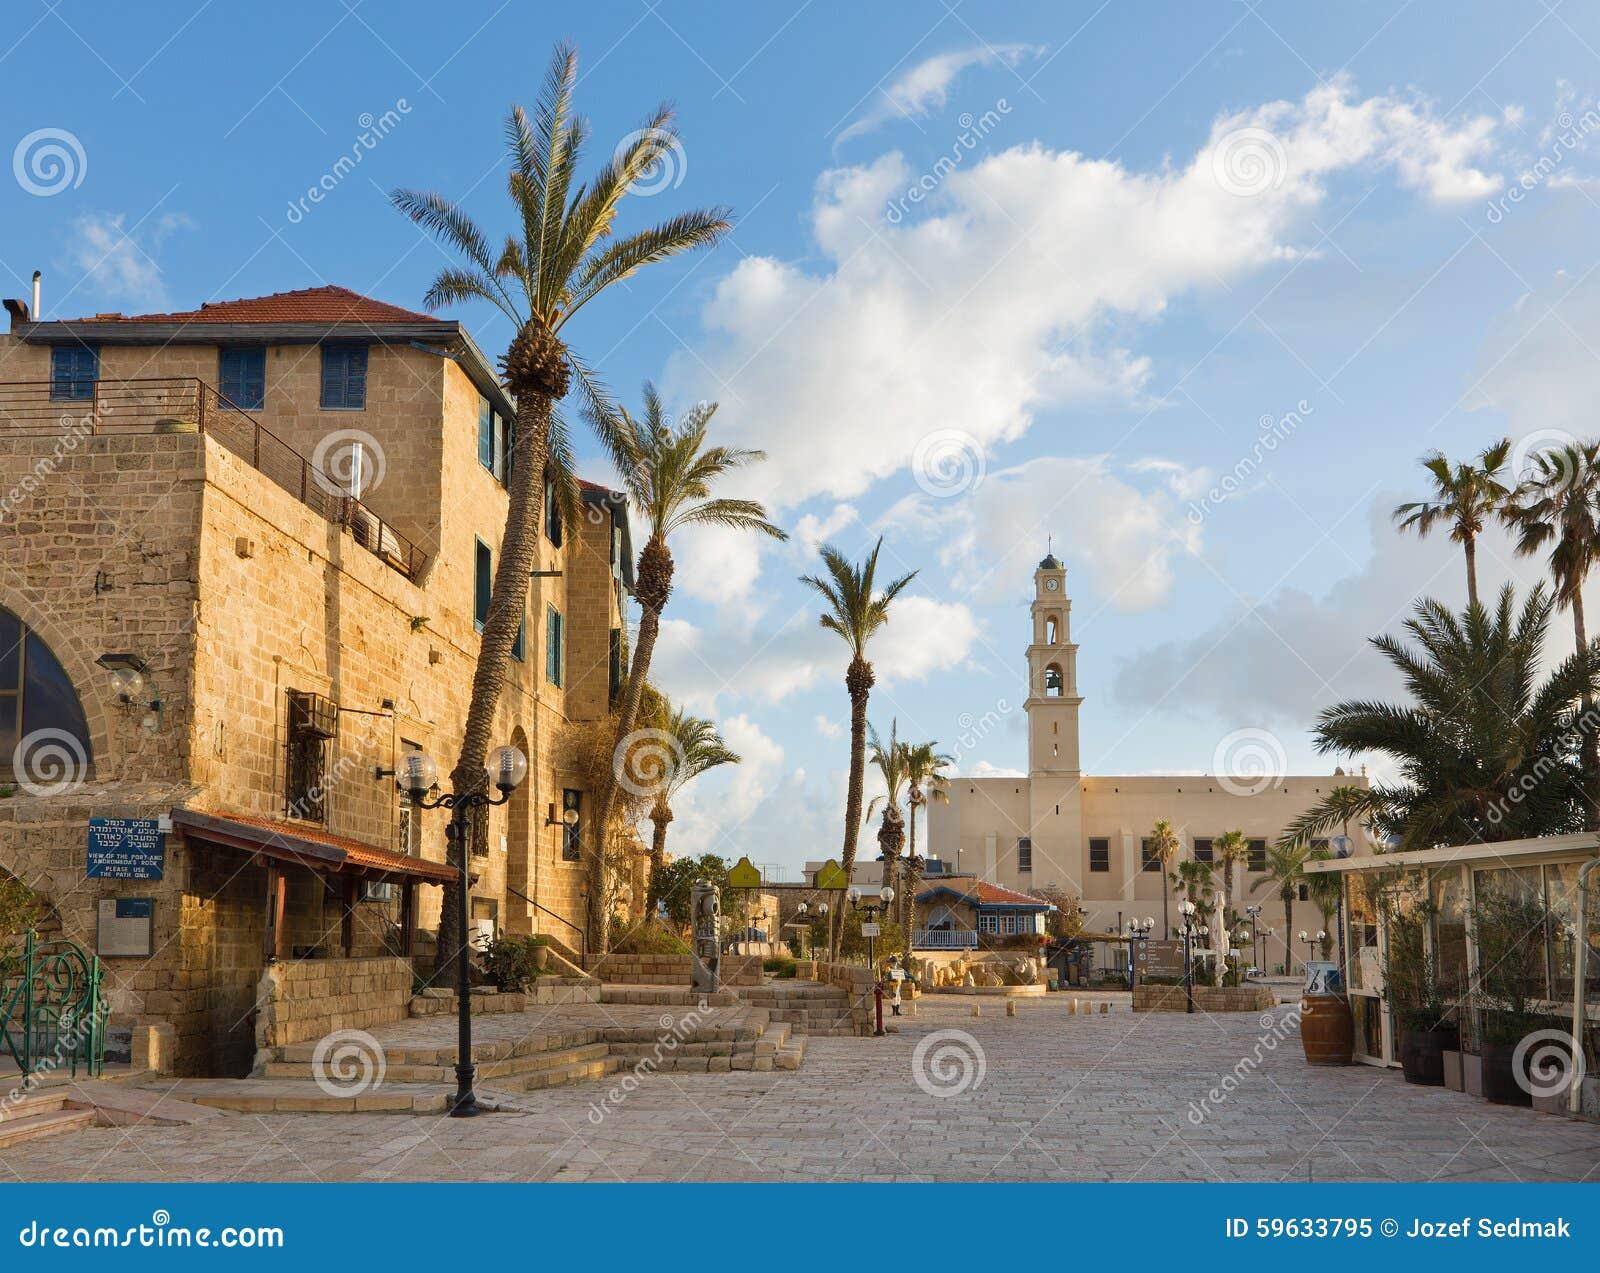 Tel Aviv - The st. Peters church in old Jaffa on Kedumim Square.